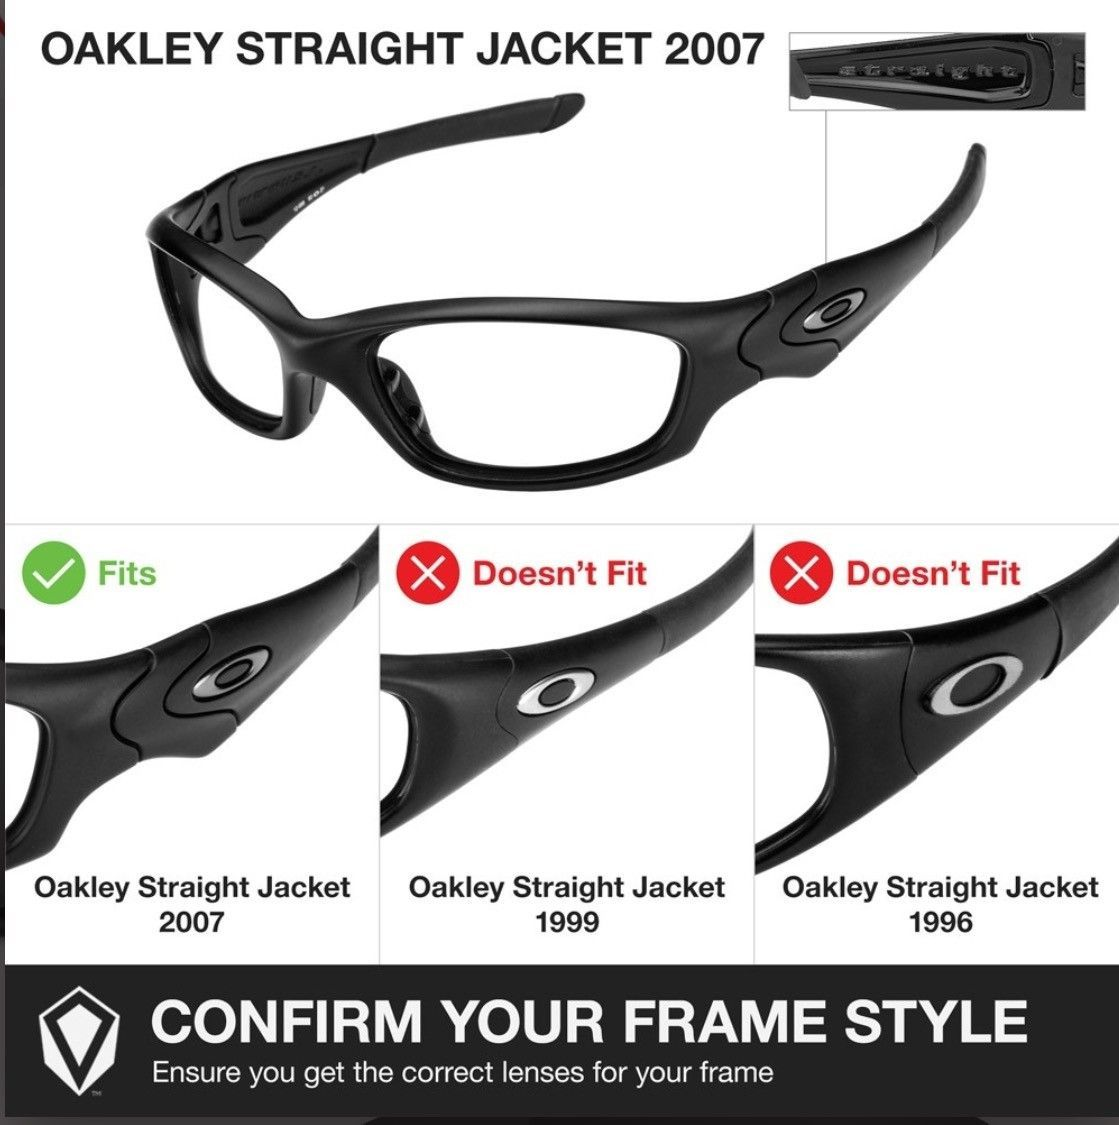 Straight Jacket - Pre 07 and Post 07? - image.jpeg